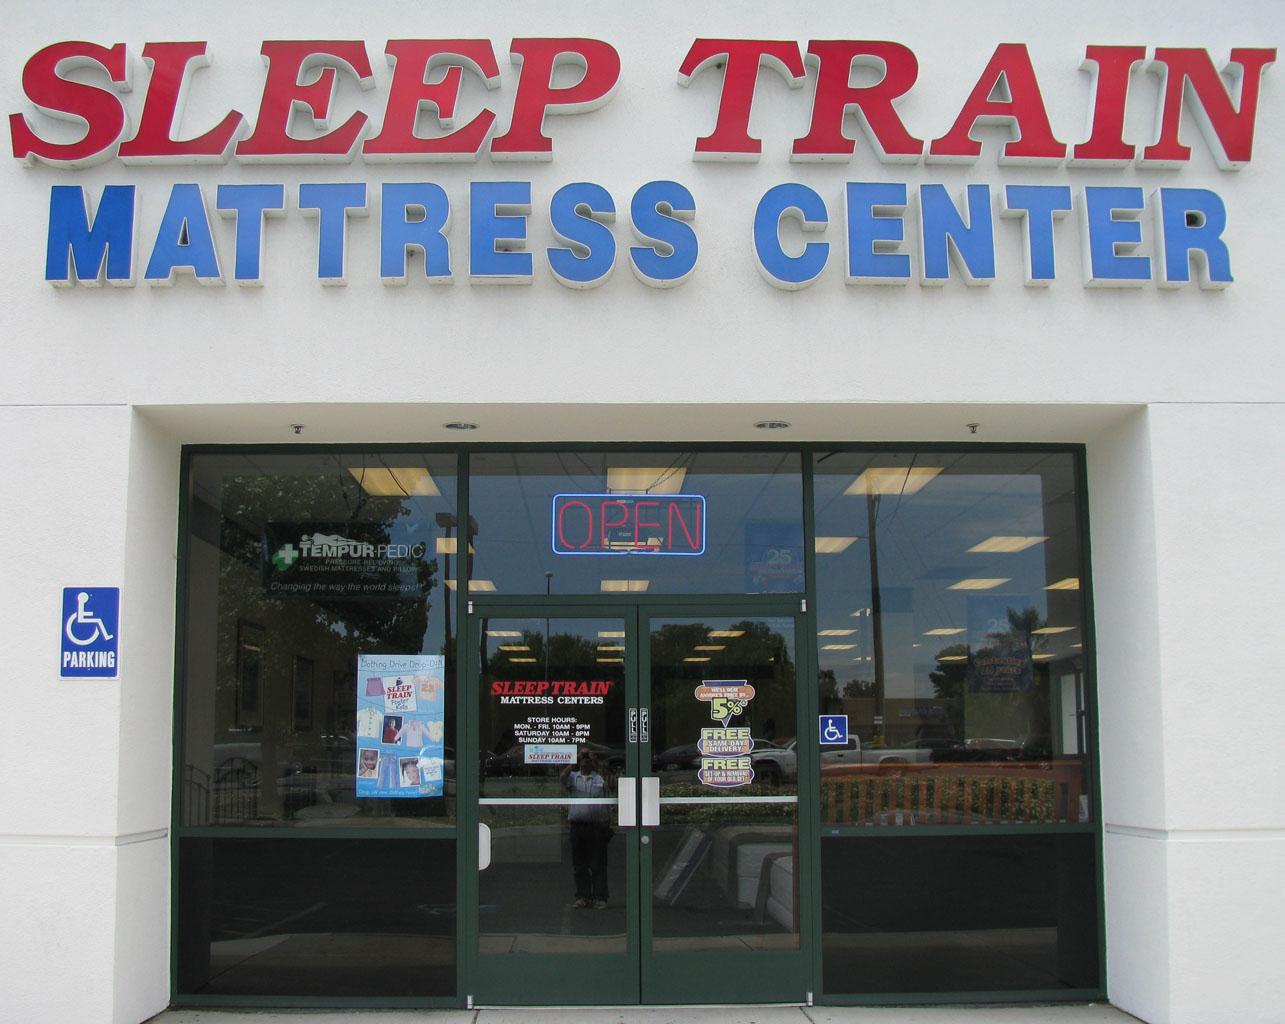 mattress full on of unforgettable images train size pinterest our photos sleep best leesa design